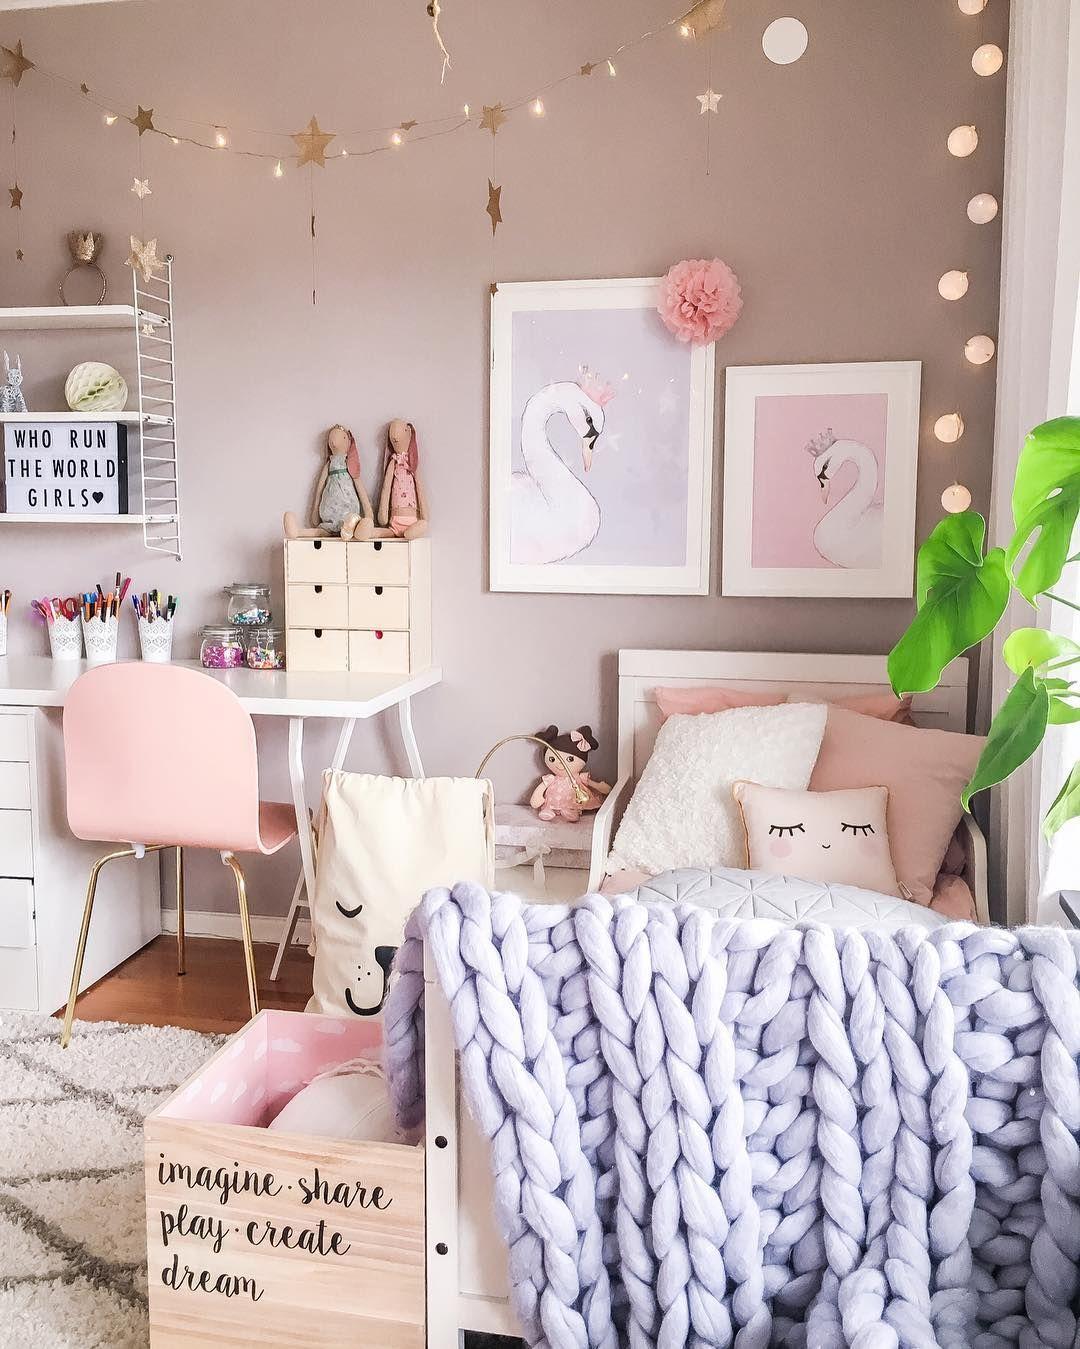 Mansion Bedrooms For Girls Cool Looking Bedrooms For Girls Brick Wallpaper Bedroom Bedroom Paint Ideas In Pakistan: (@interiorbysarahstrath) På Instagram